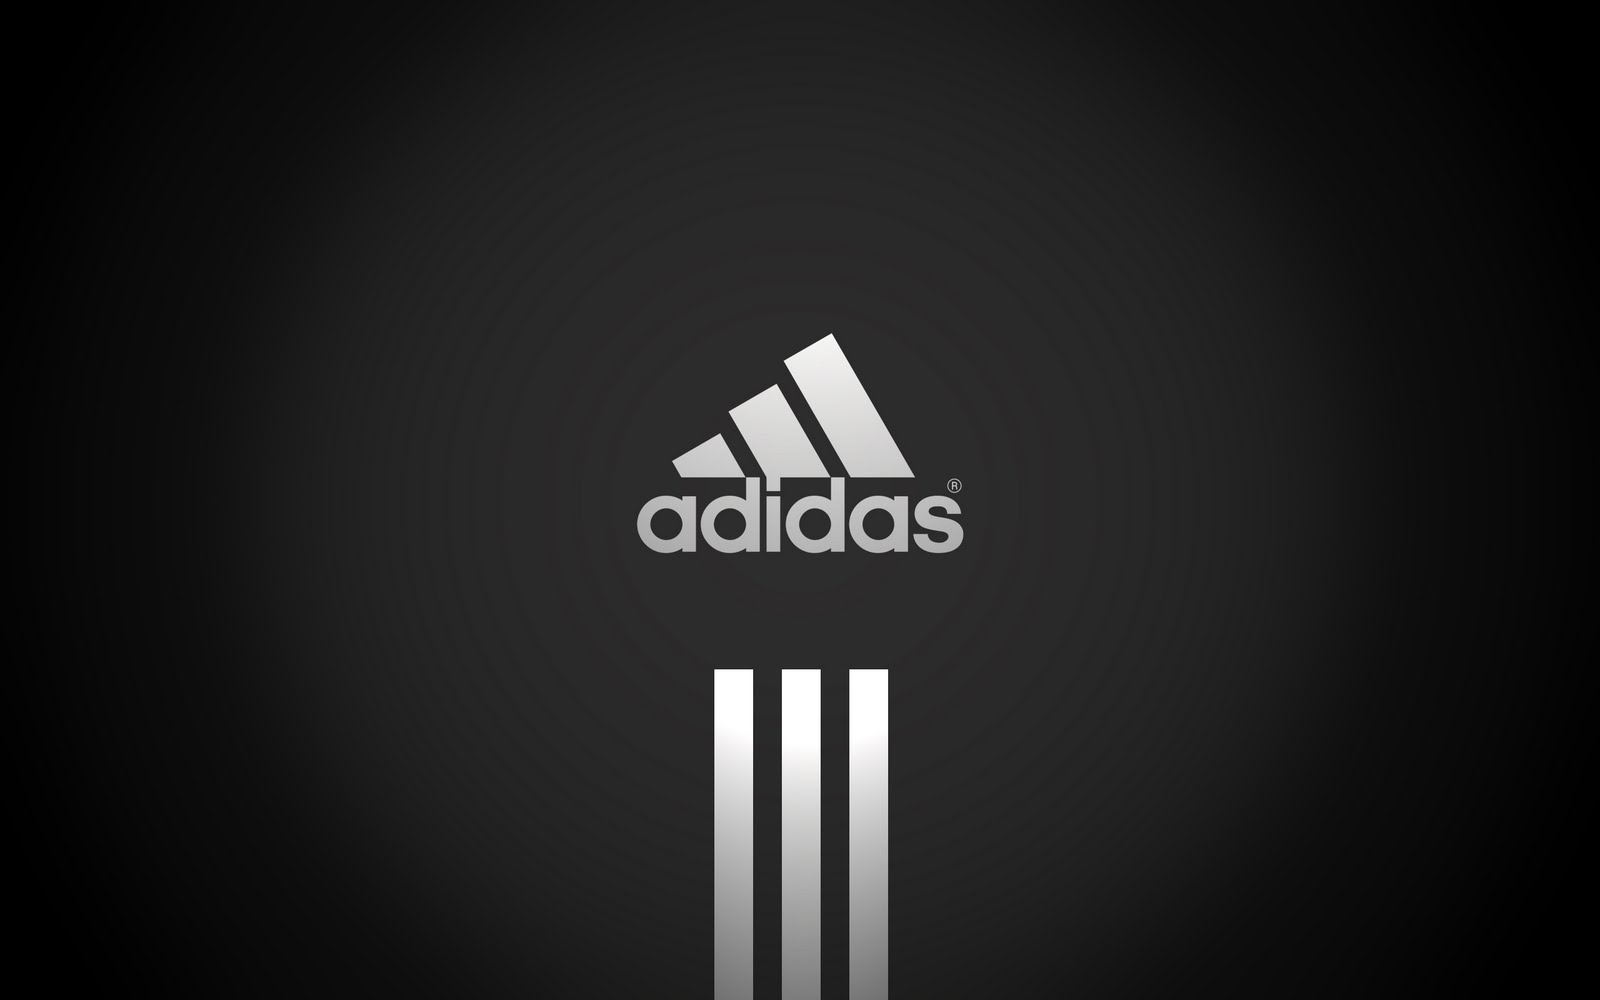 Adidas Logo Hd Wallpapers Desktop Wallpapers